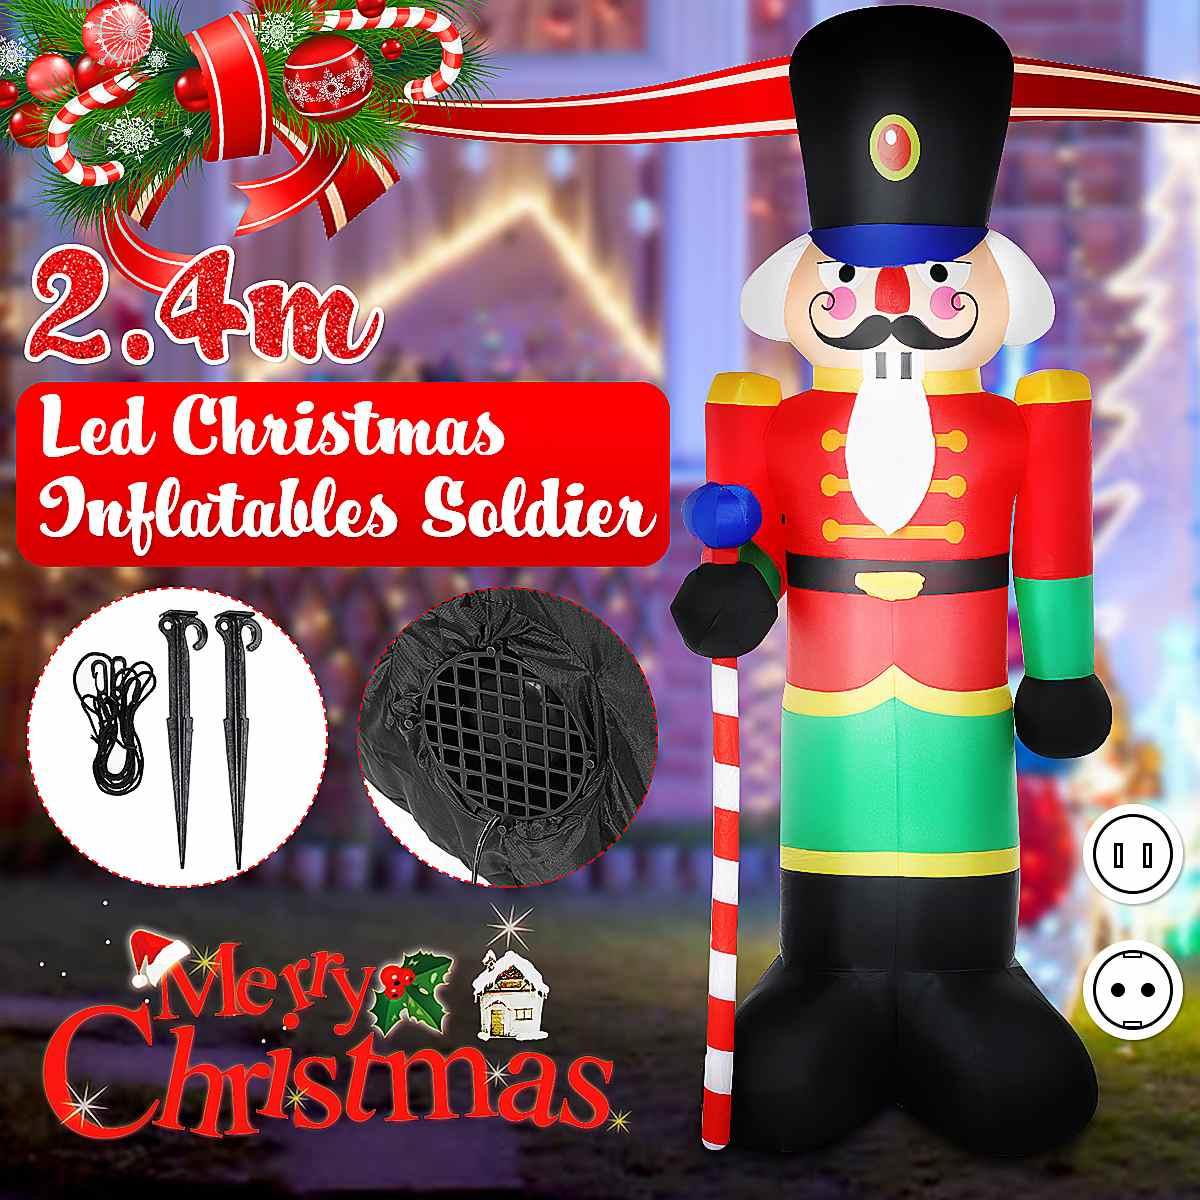 240cm Air Inflatable Statue Claus Outdoor Garden Inflatable Nutcracker Soldier LED Night Light Christmas Balloons Xmas Decor